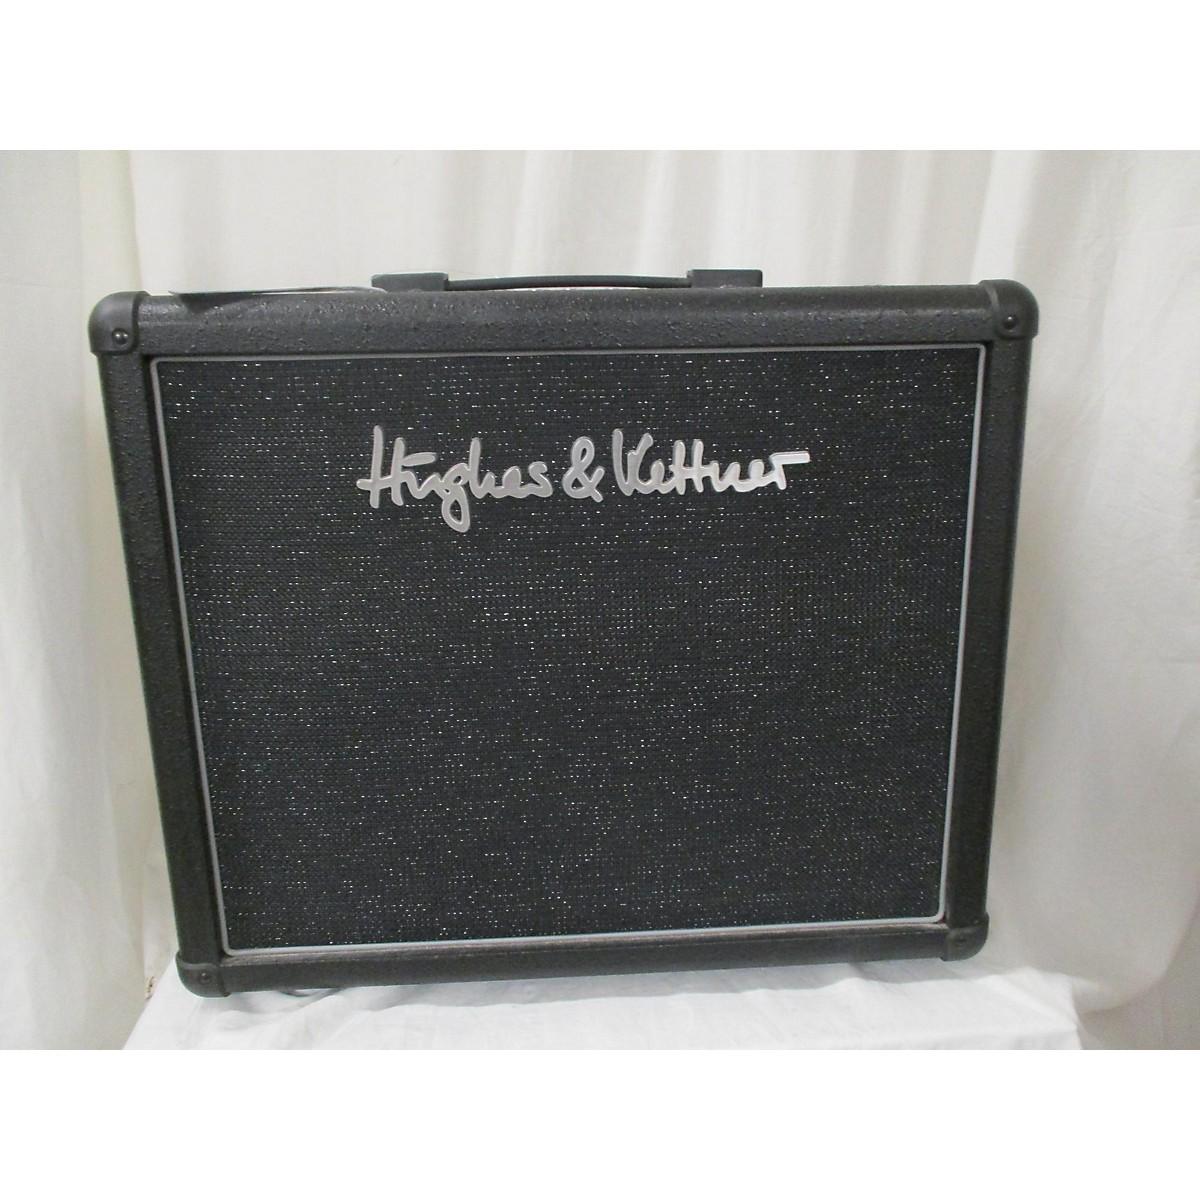 Hughes & Kettner 25TH EDITION TUBE Tube Guitar Combo Amp